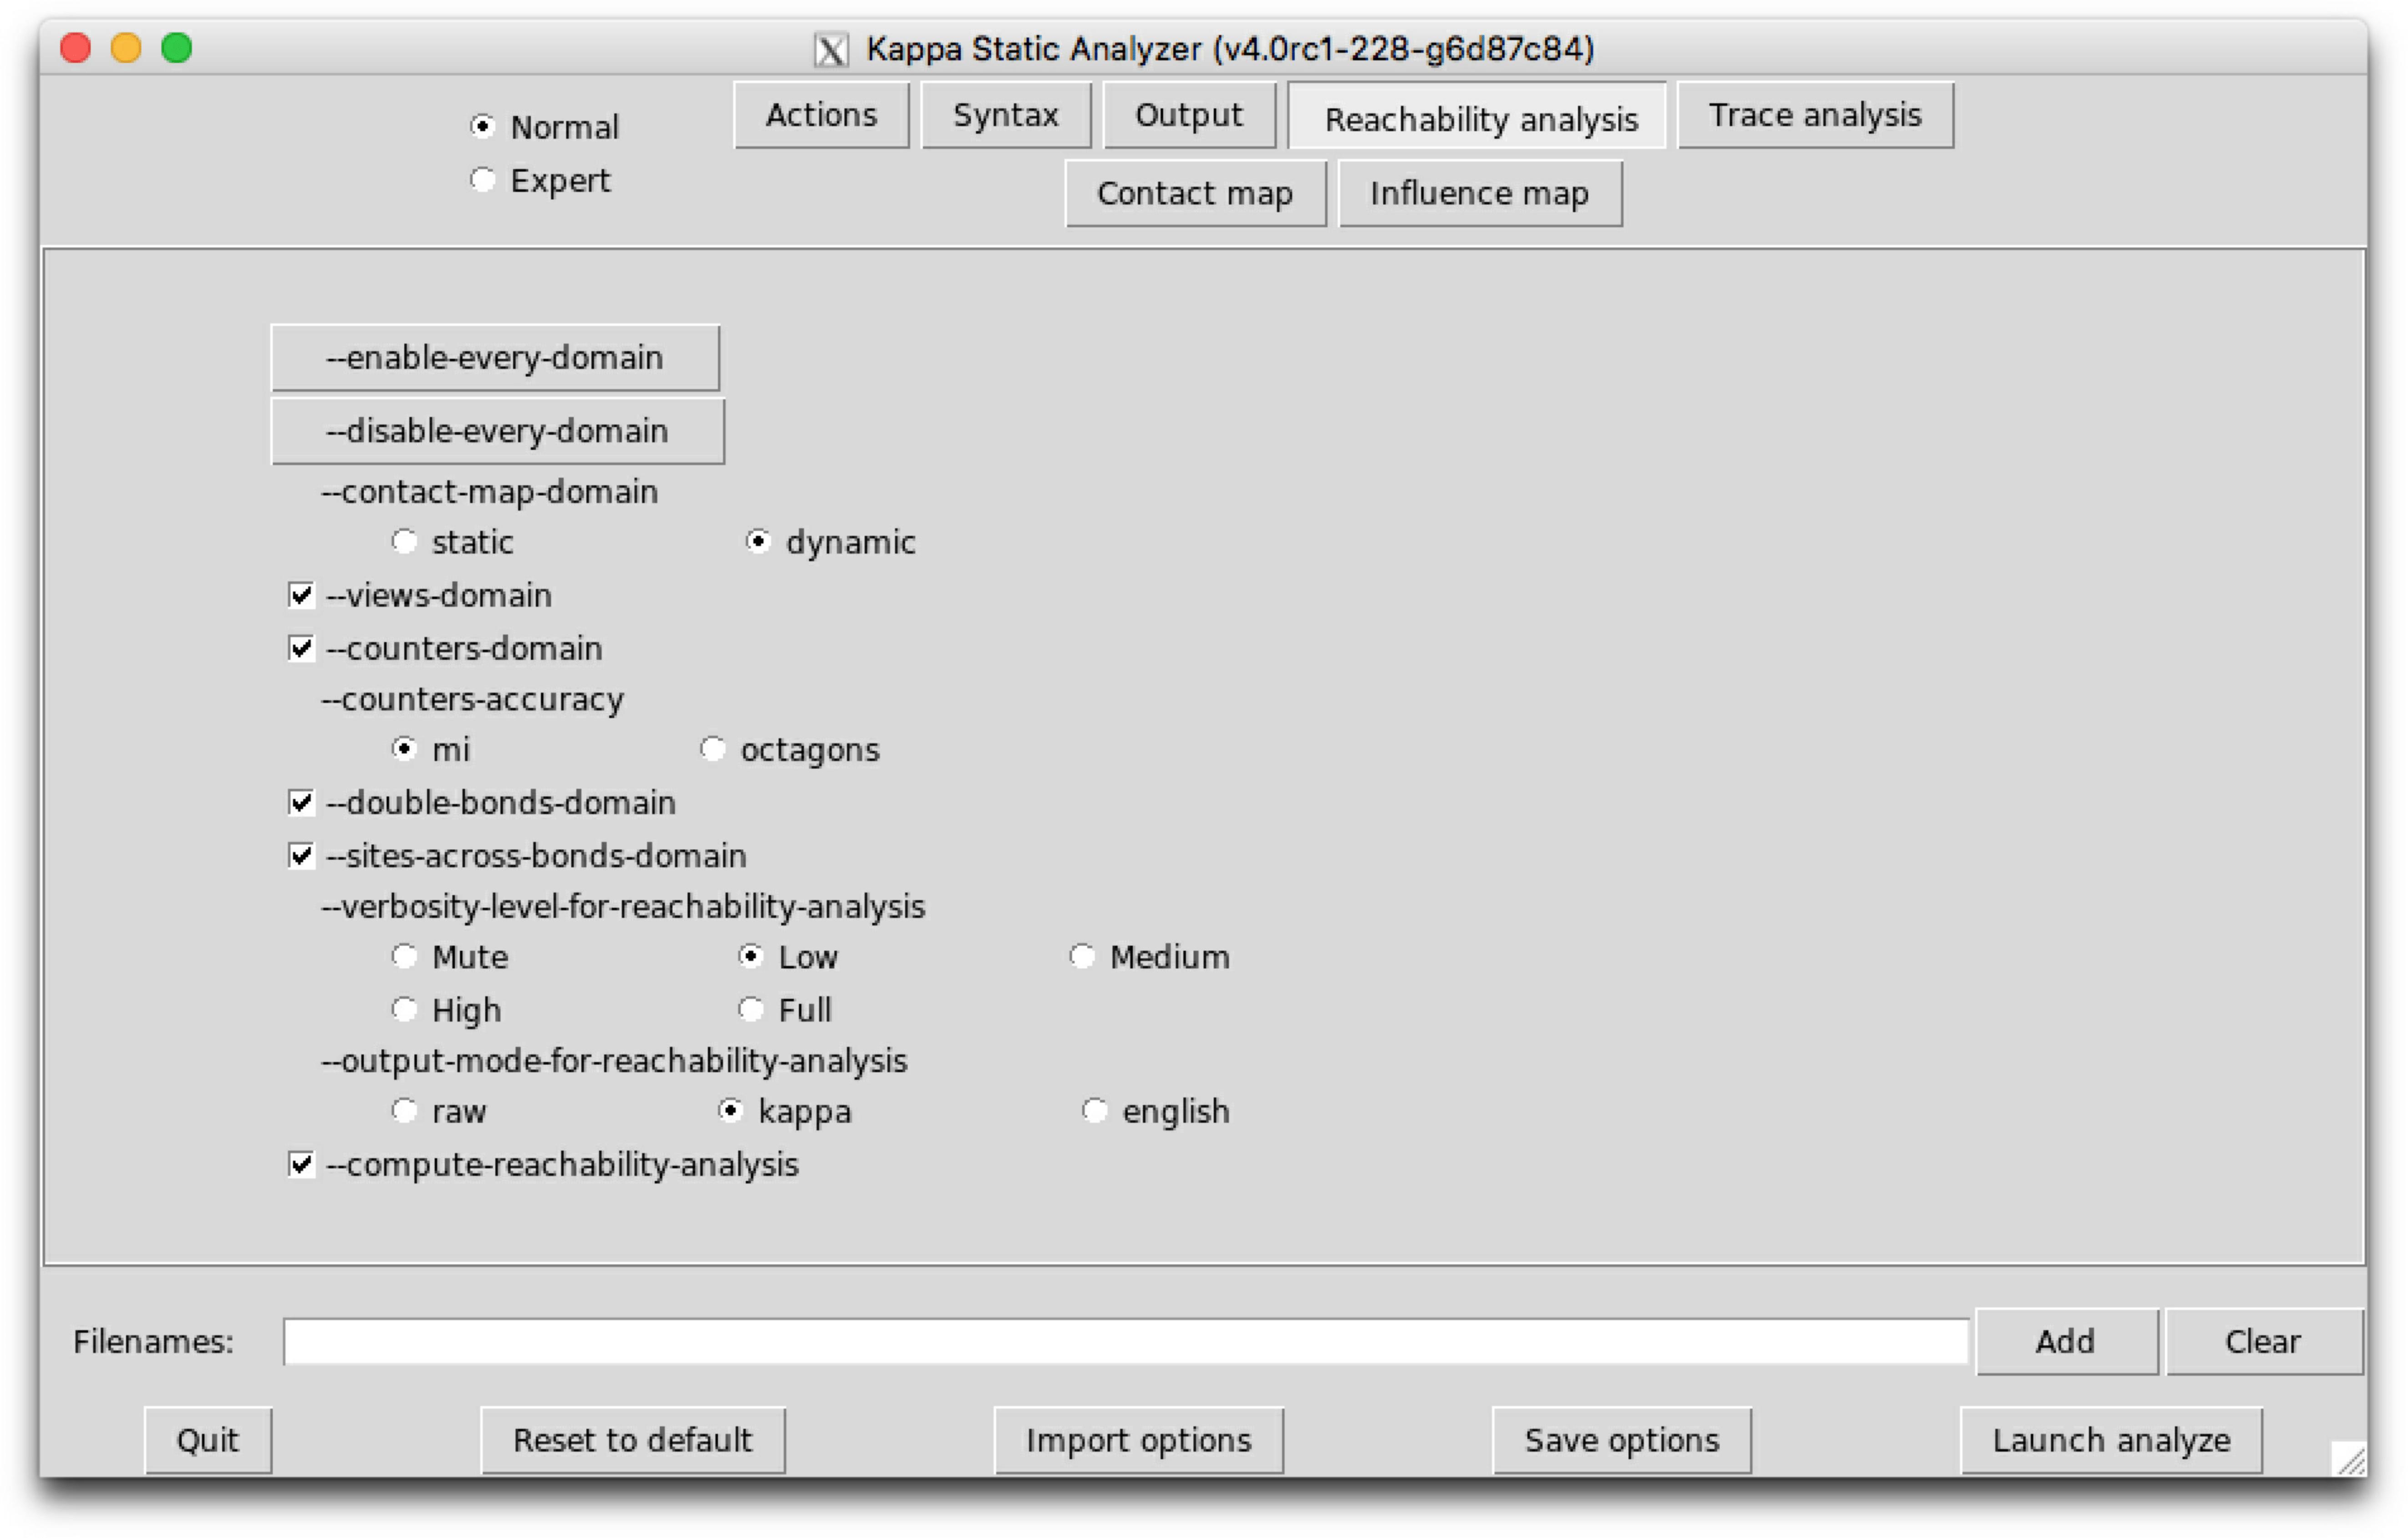 Kappa tools reference manual (release v4 0 93-kappy-12-g6e8e28d)